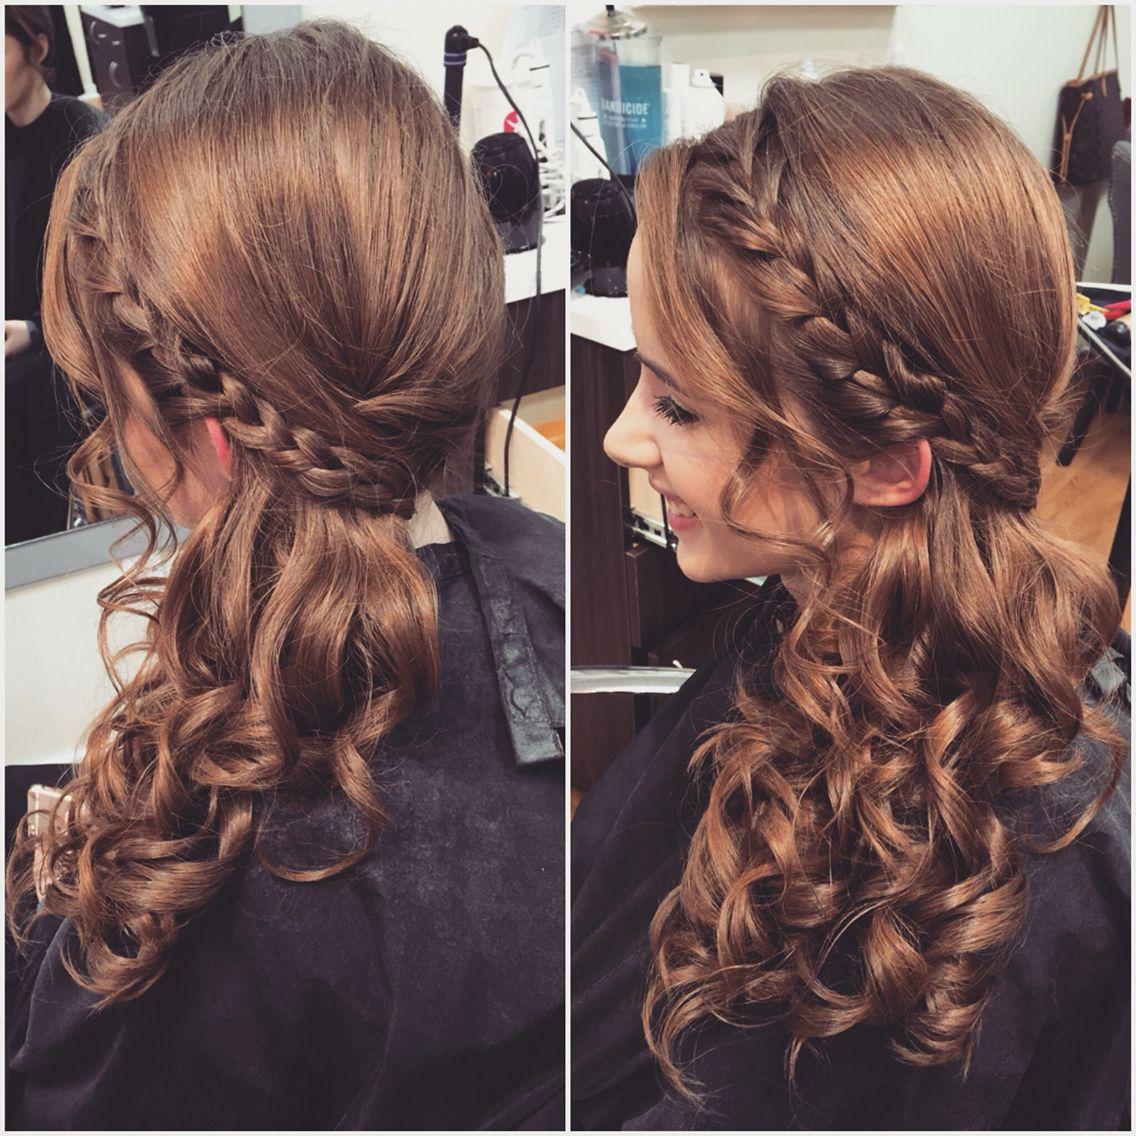 Side Swept Wedding Hair: Side Swept Updo With Braid Done By Tara Tozzi